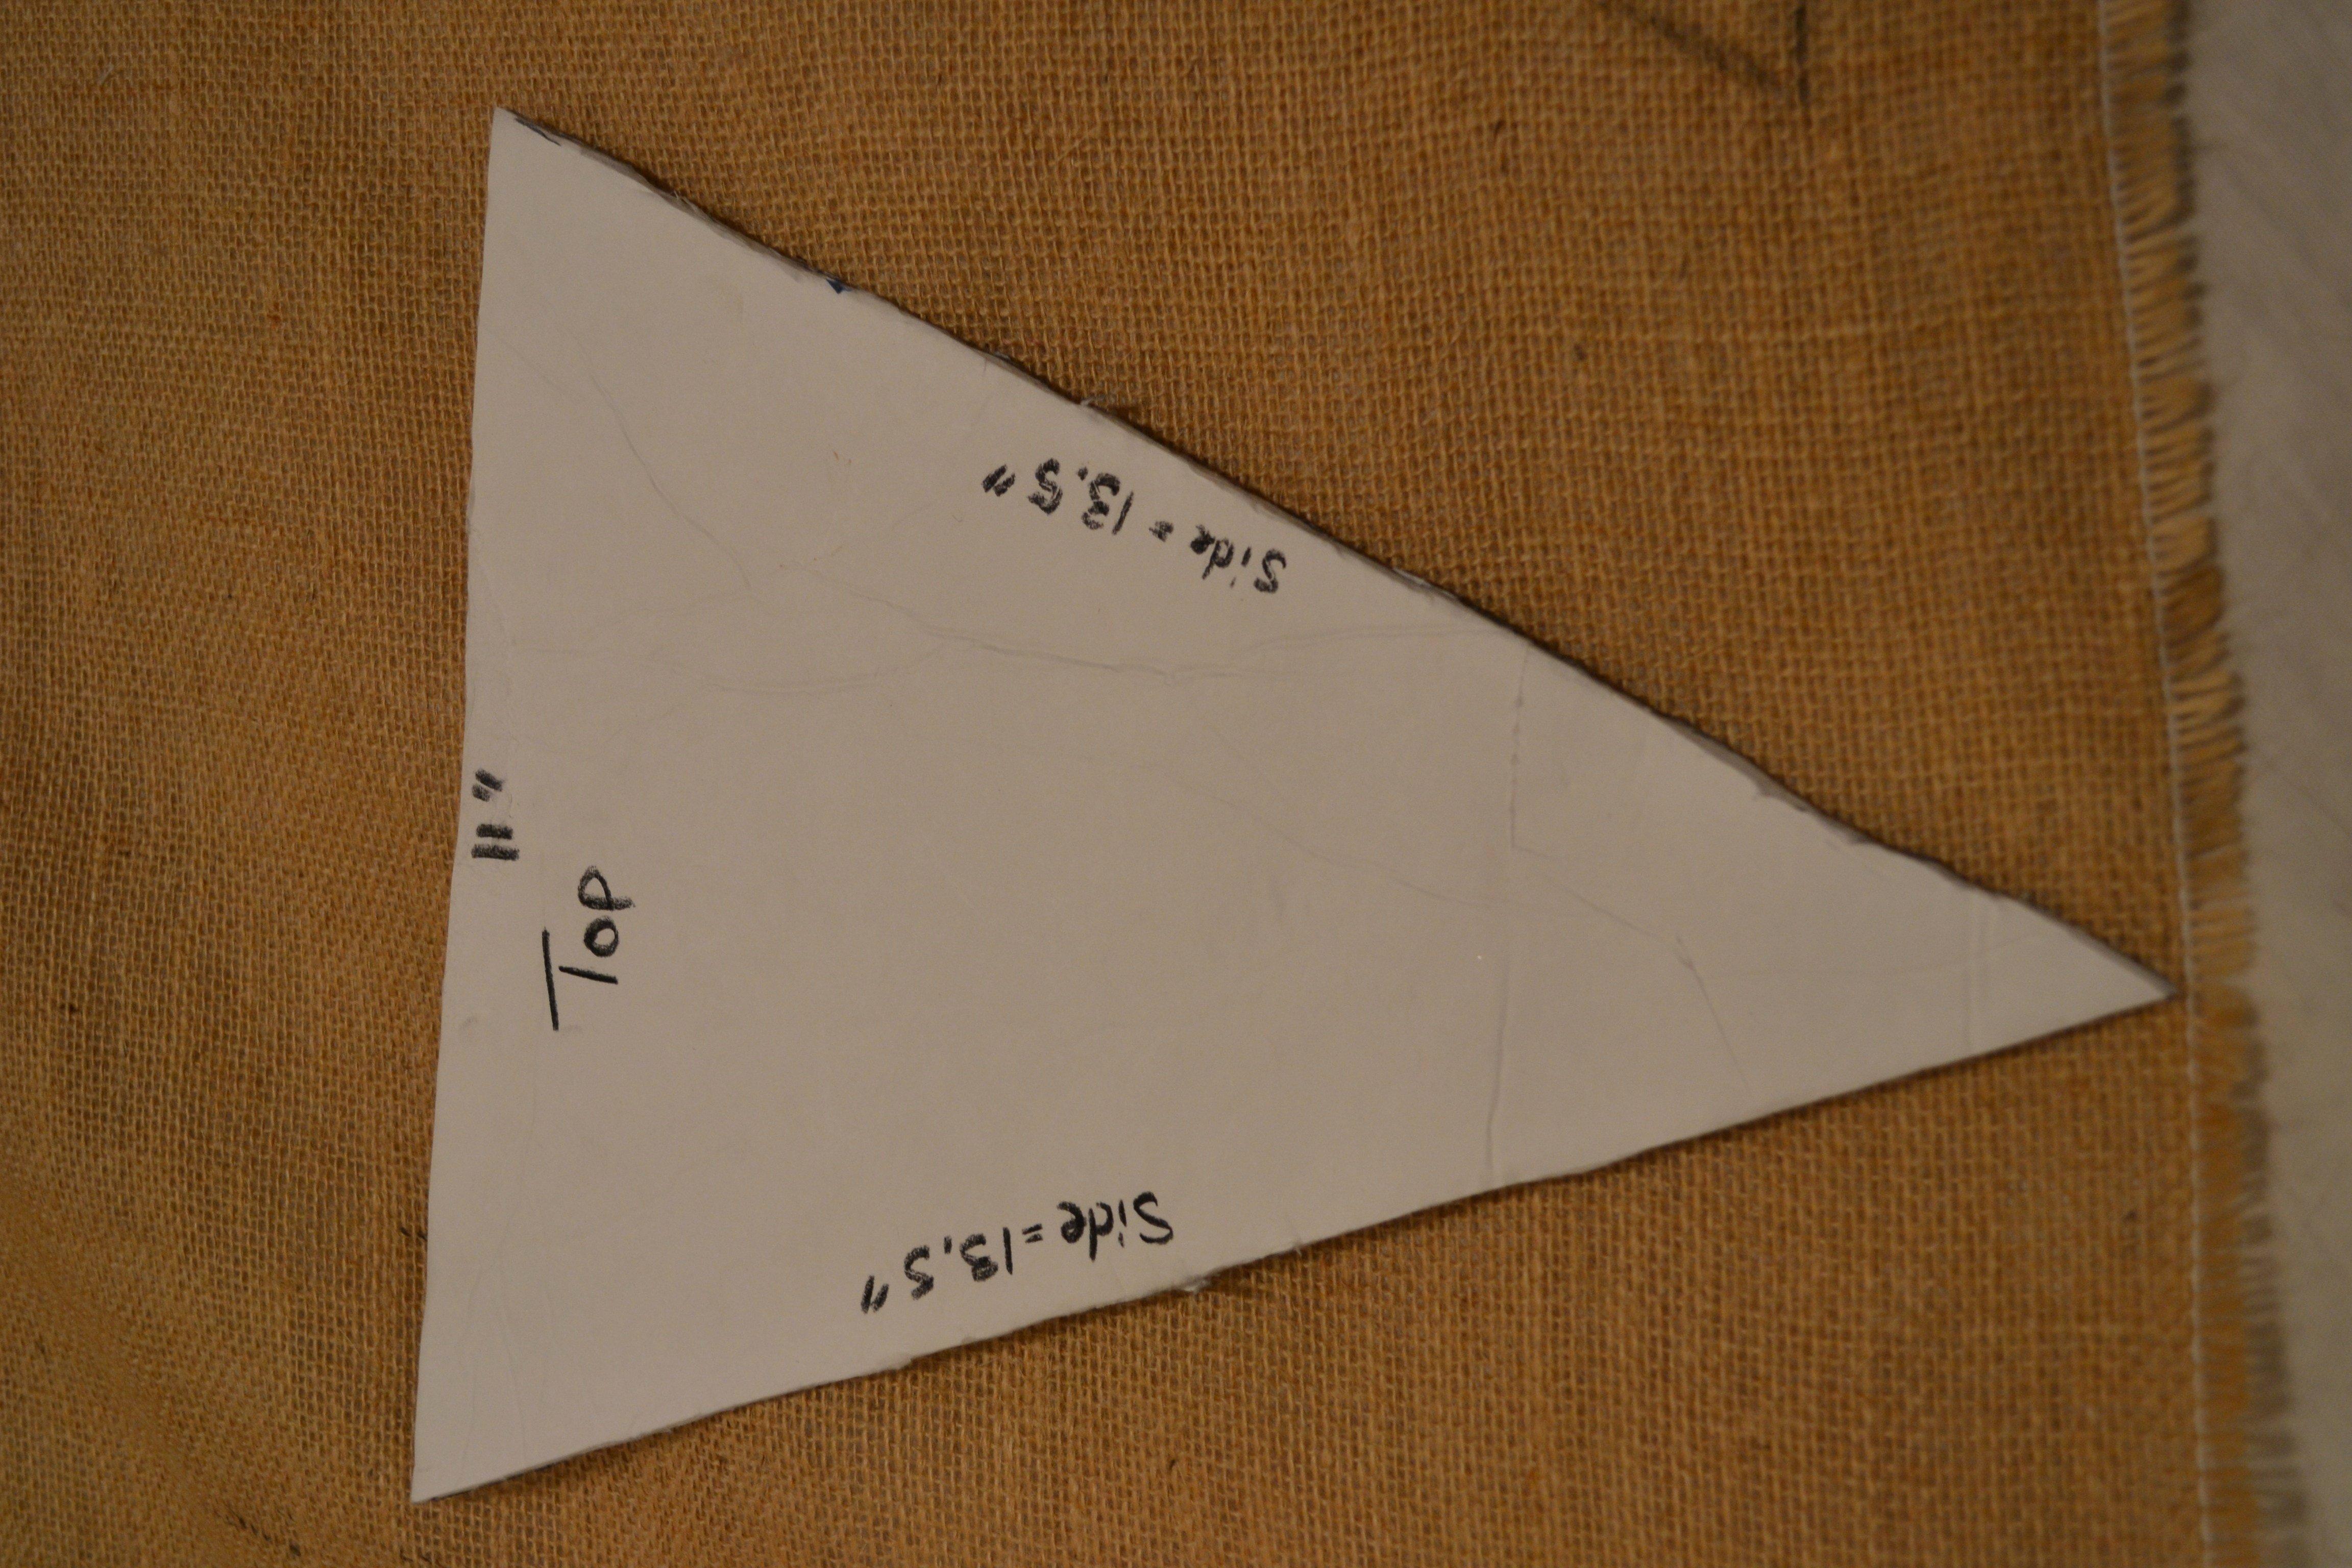 Diy Pennant Banner Template Awesome Diy Burlap Pennant Banner